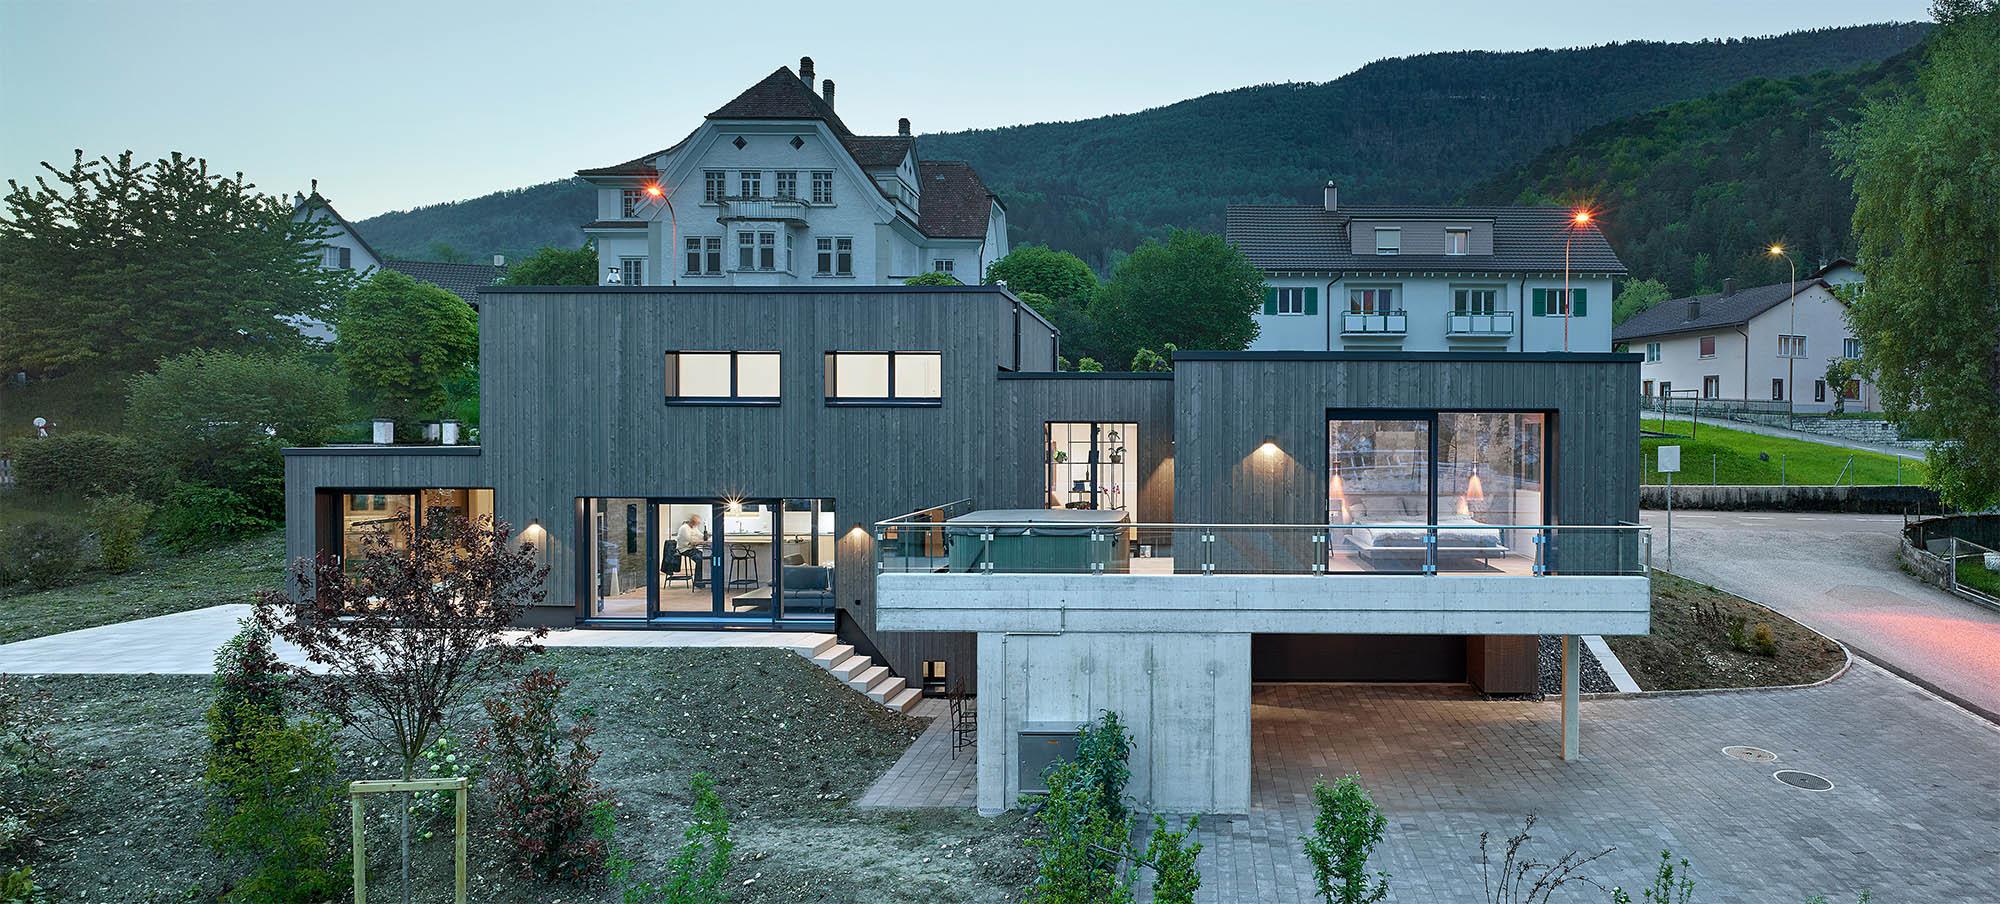 RP architecture - Accueil